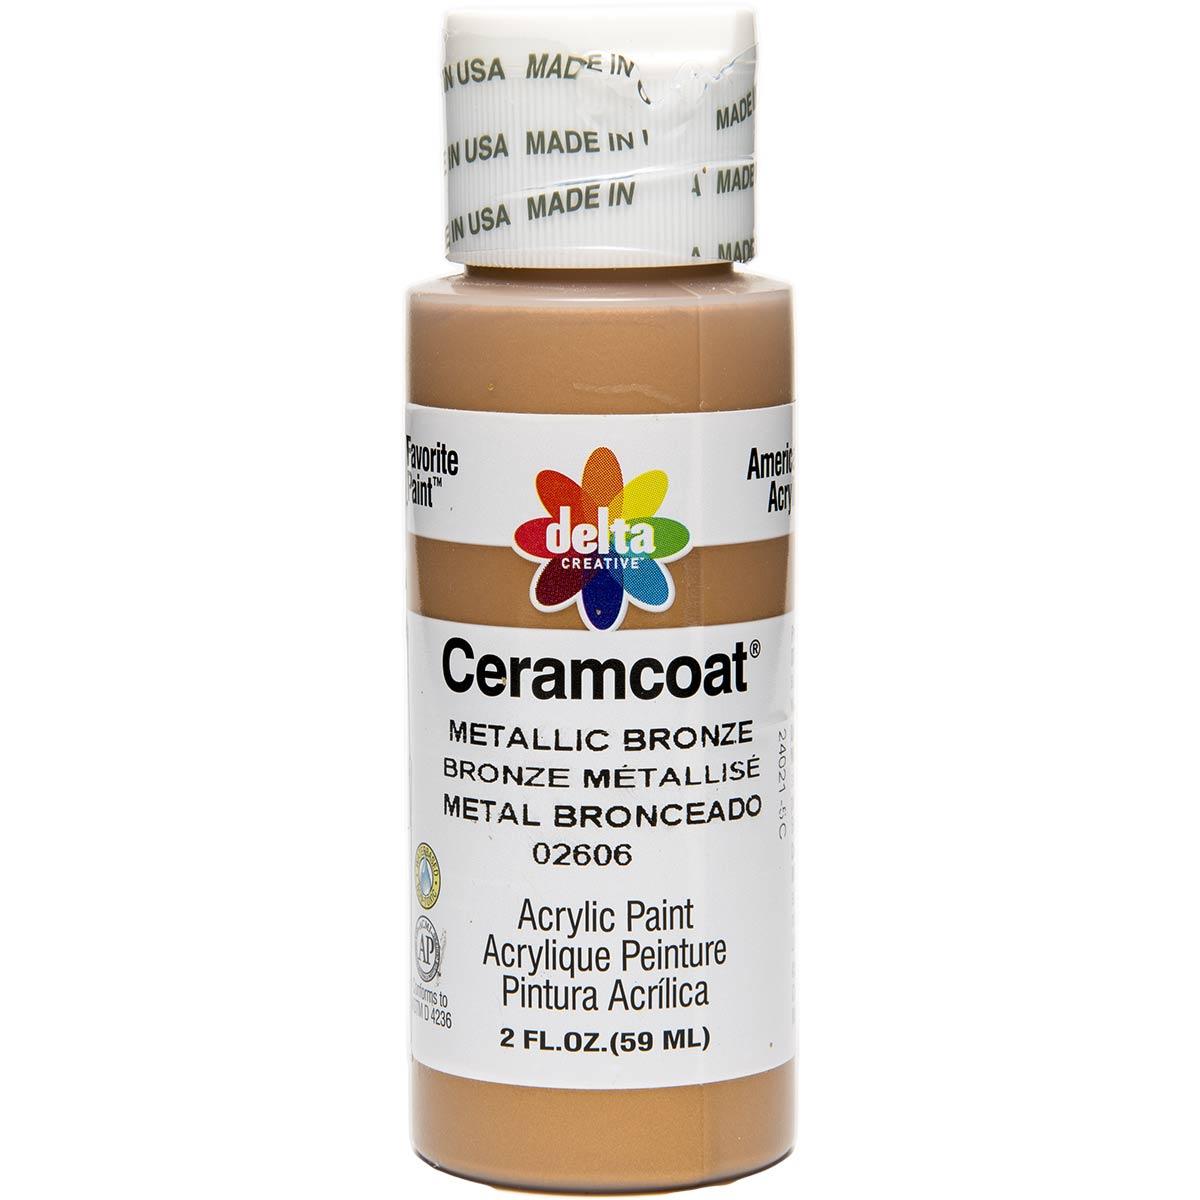 Delta Ceramcoat ® Acrylic Paint - Metallic Bronze, 2 oz.